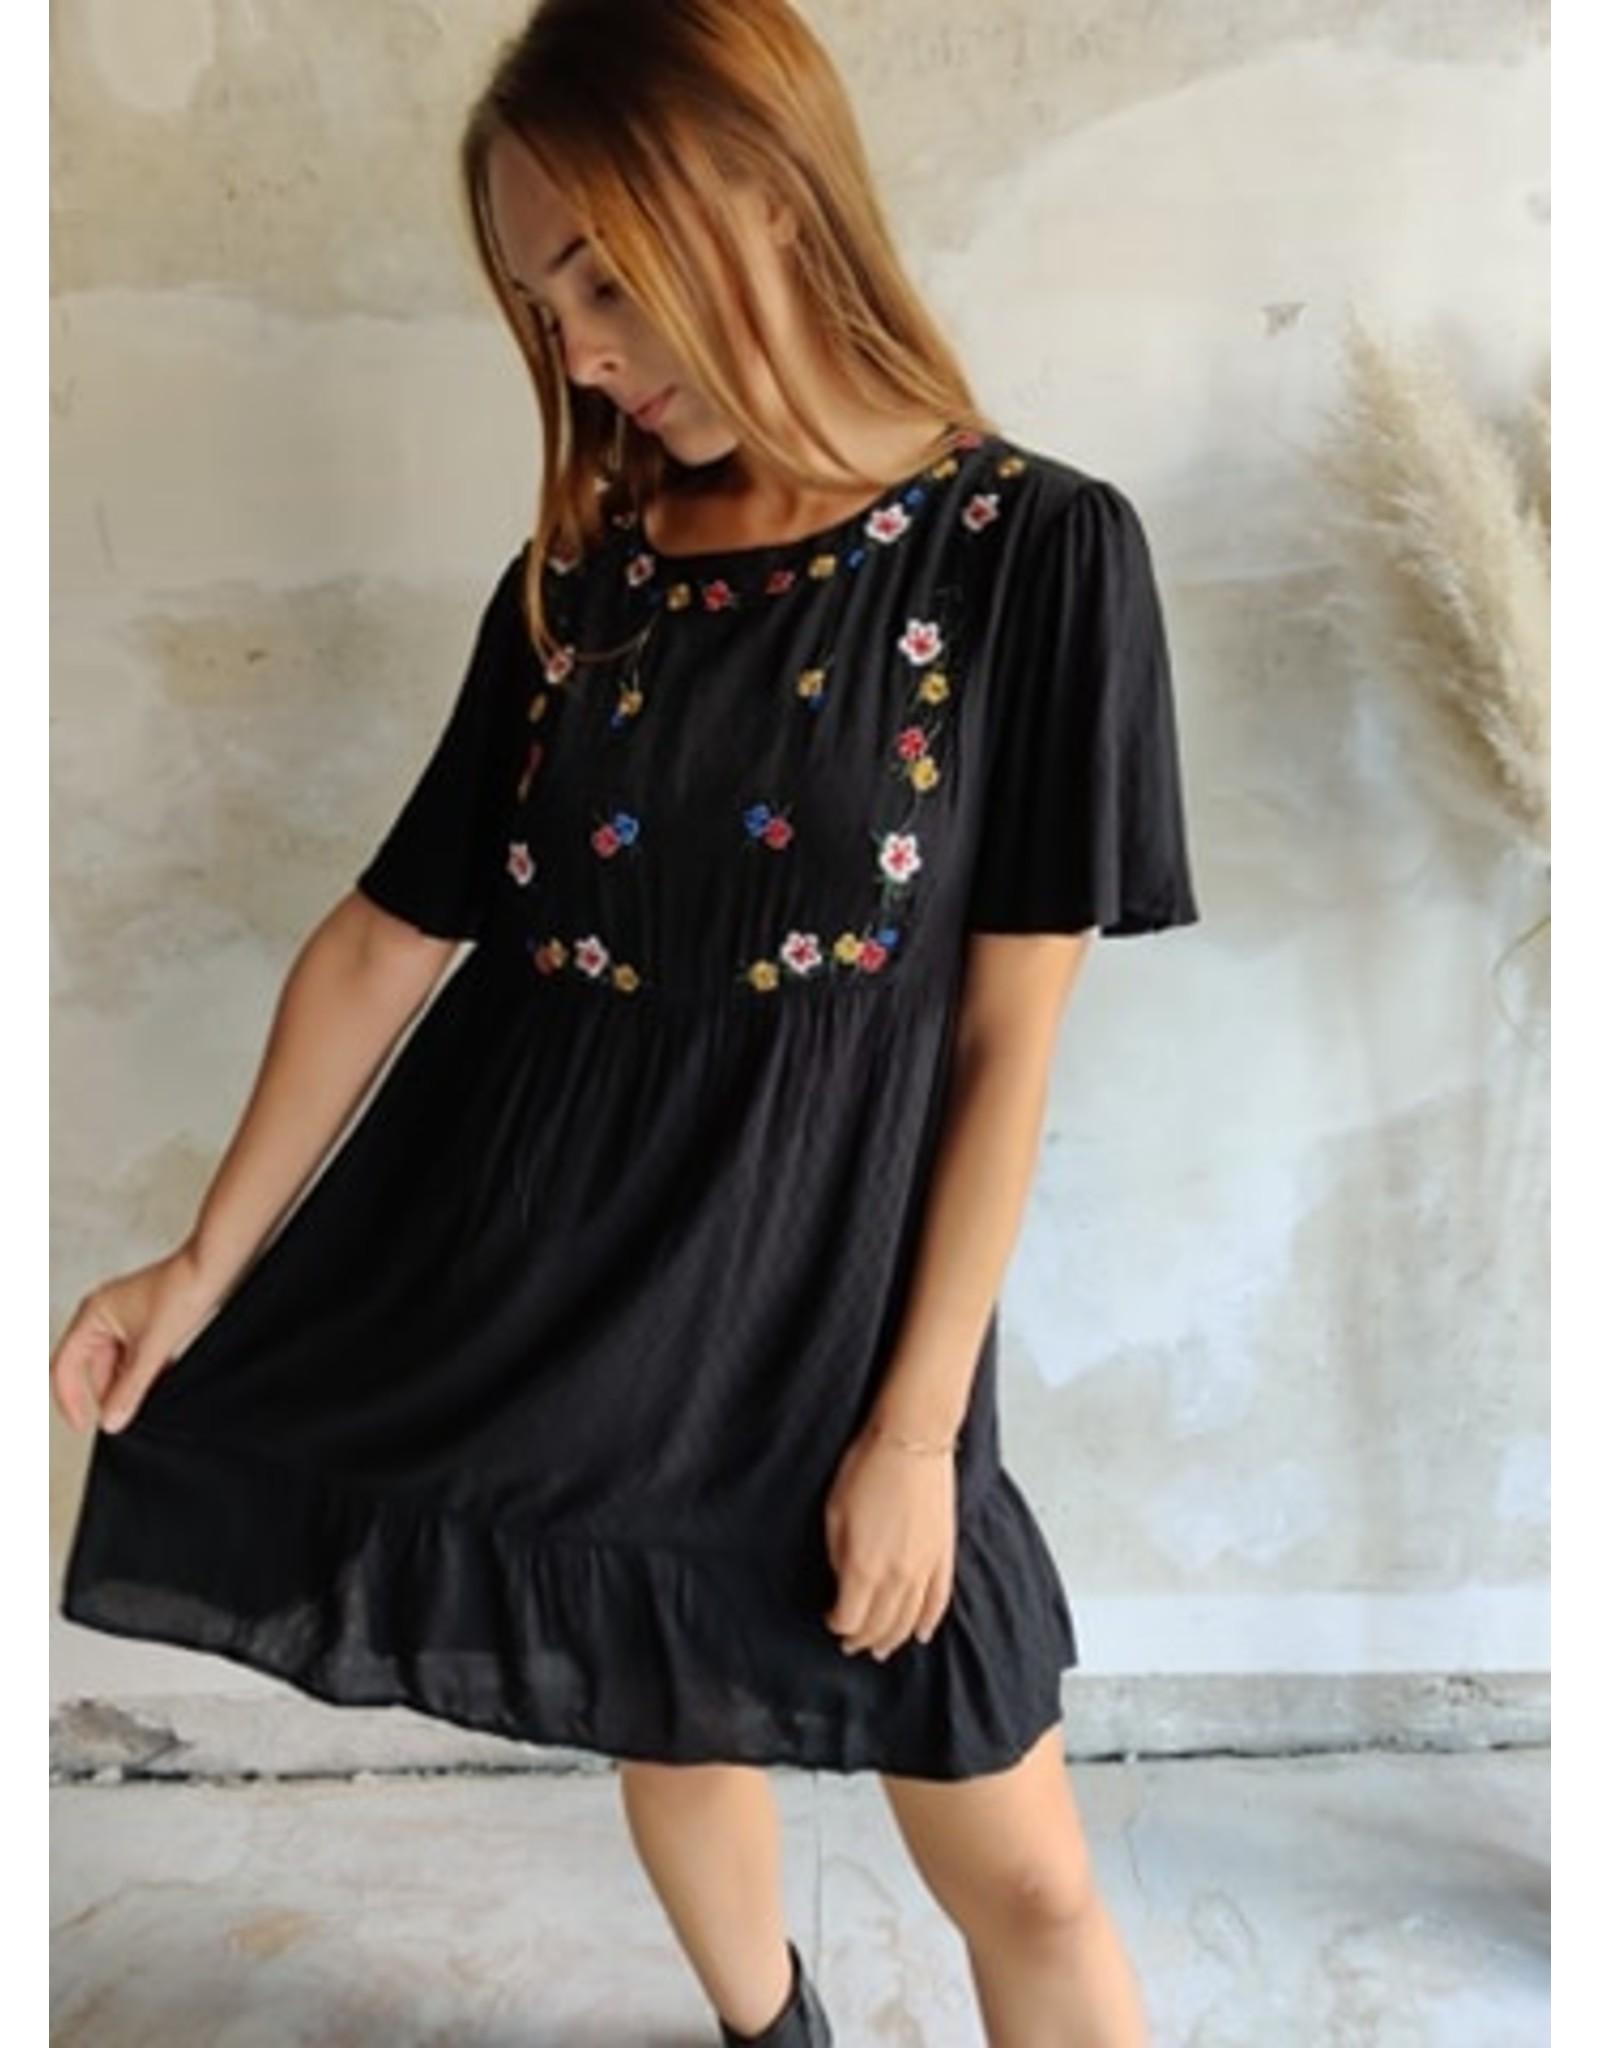 LITTLE DRESS WITH FLORAL DETAILS BLACK